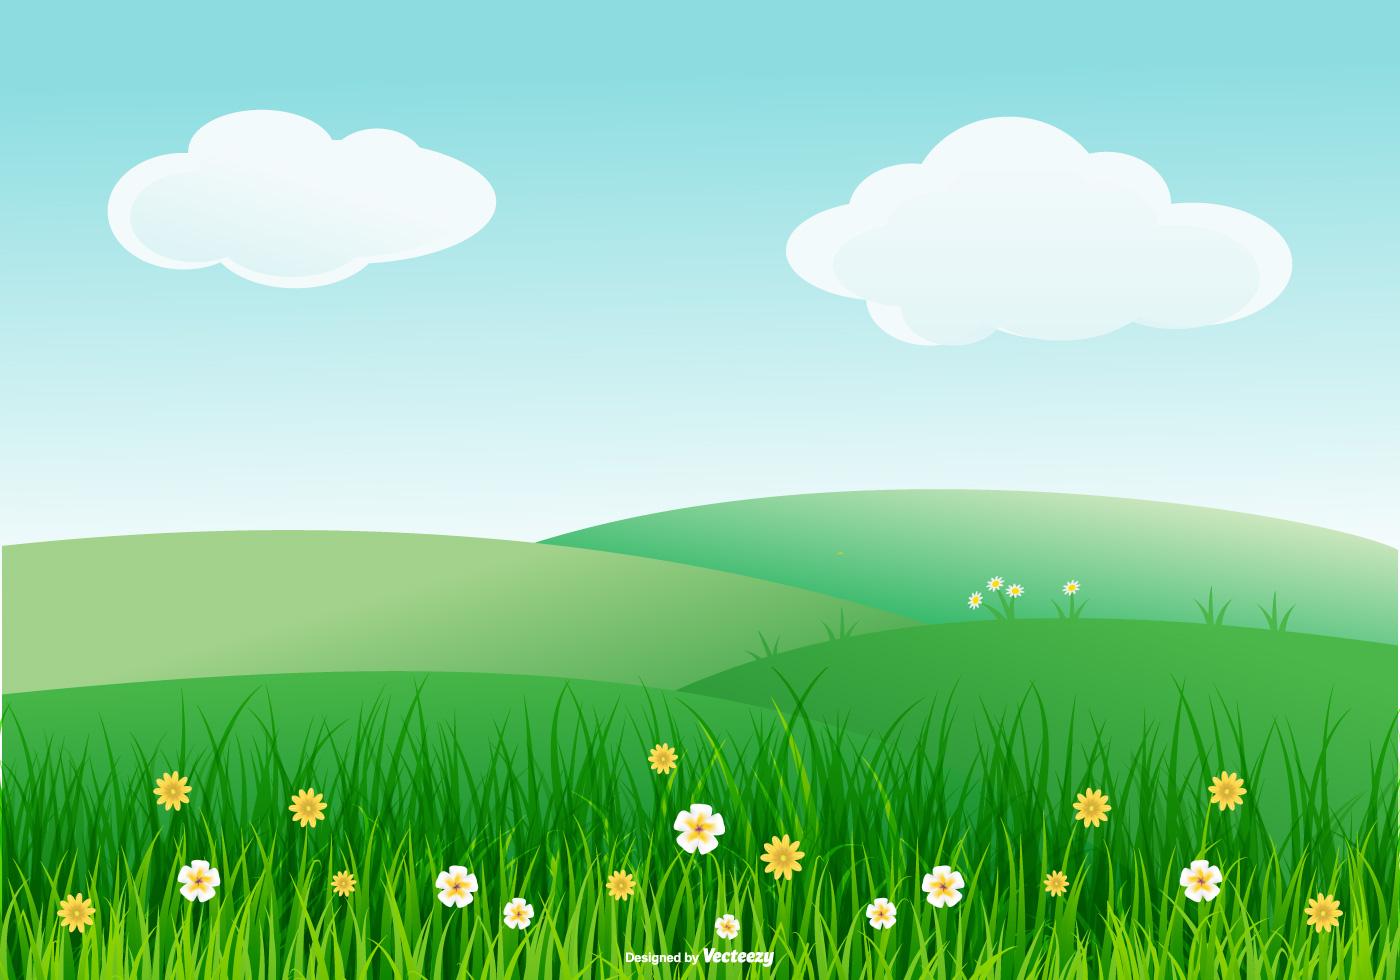 Landscape Illustration Vector Free: Beautiful Spring Landscape Illustration